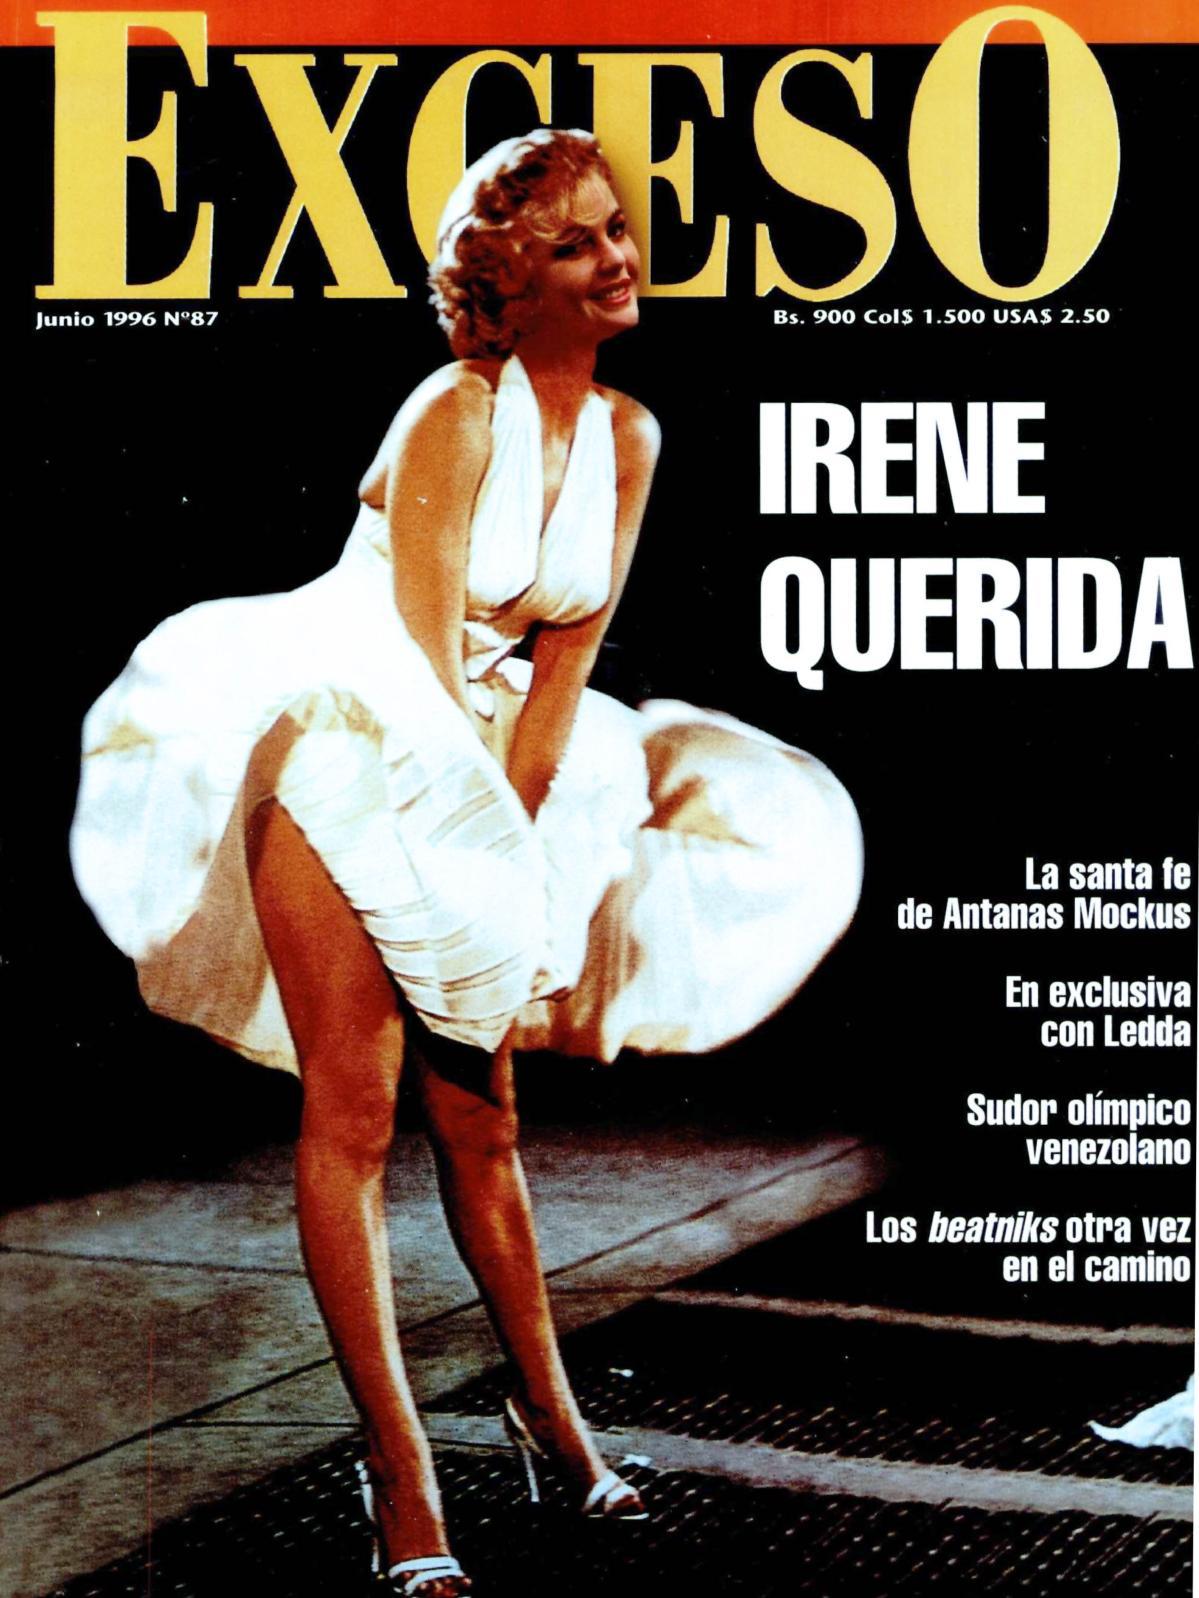 Nº 87 1996 Exceso Junio Revista Calaméo ucl3TJ1KF